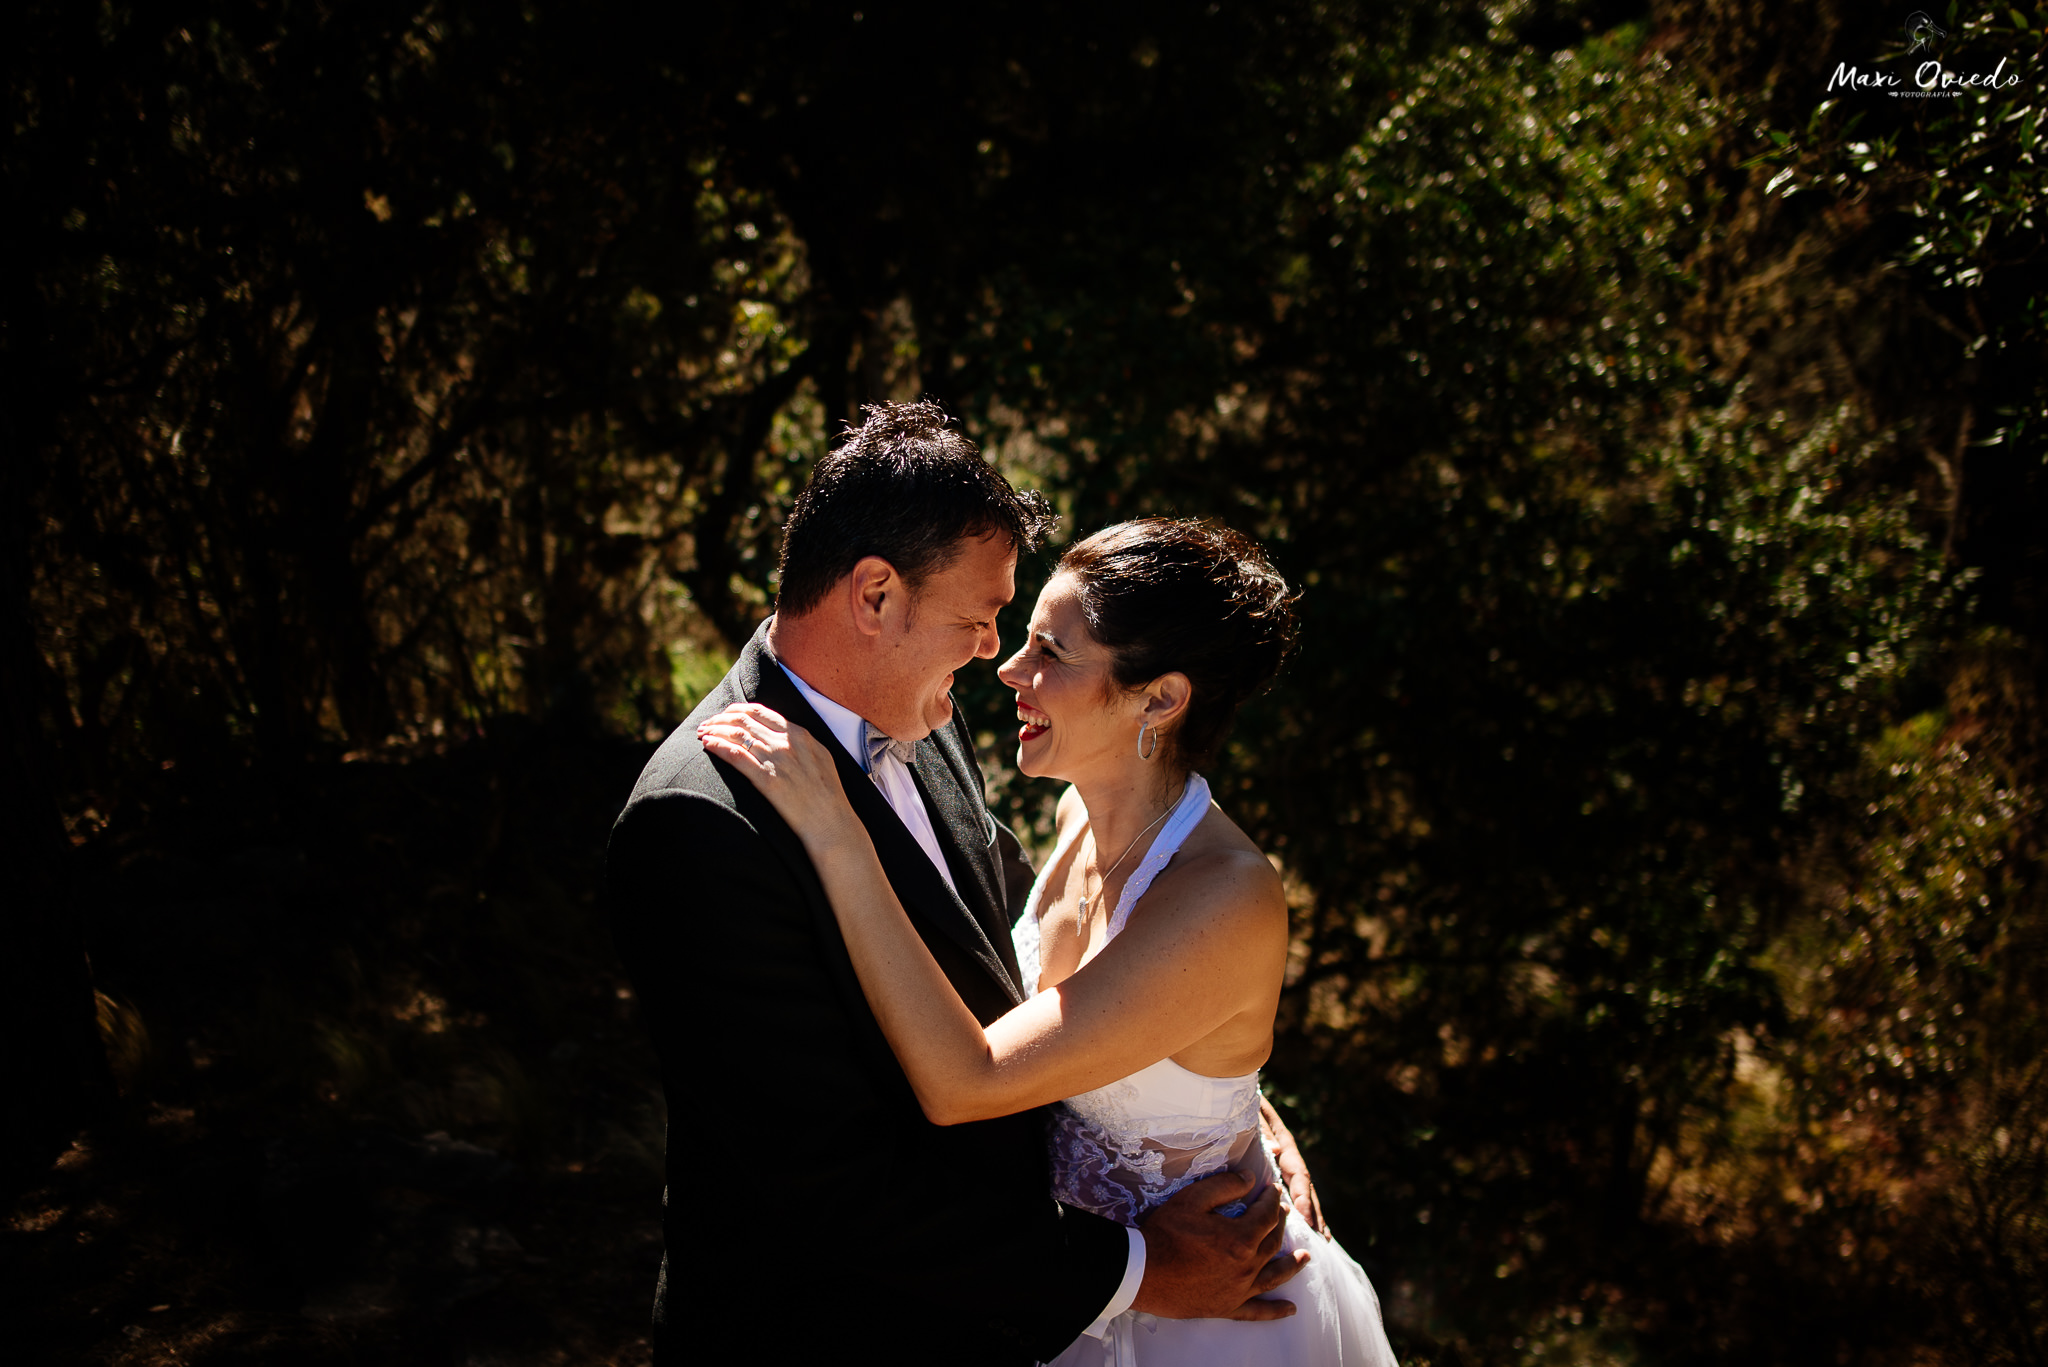 boda sextuple la cumbre cordoba cuchi corral fotografo de bodas fotografo de casamientos rosario san nicolas argentina vestido de novia ramo de novia-2.jpg